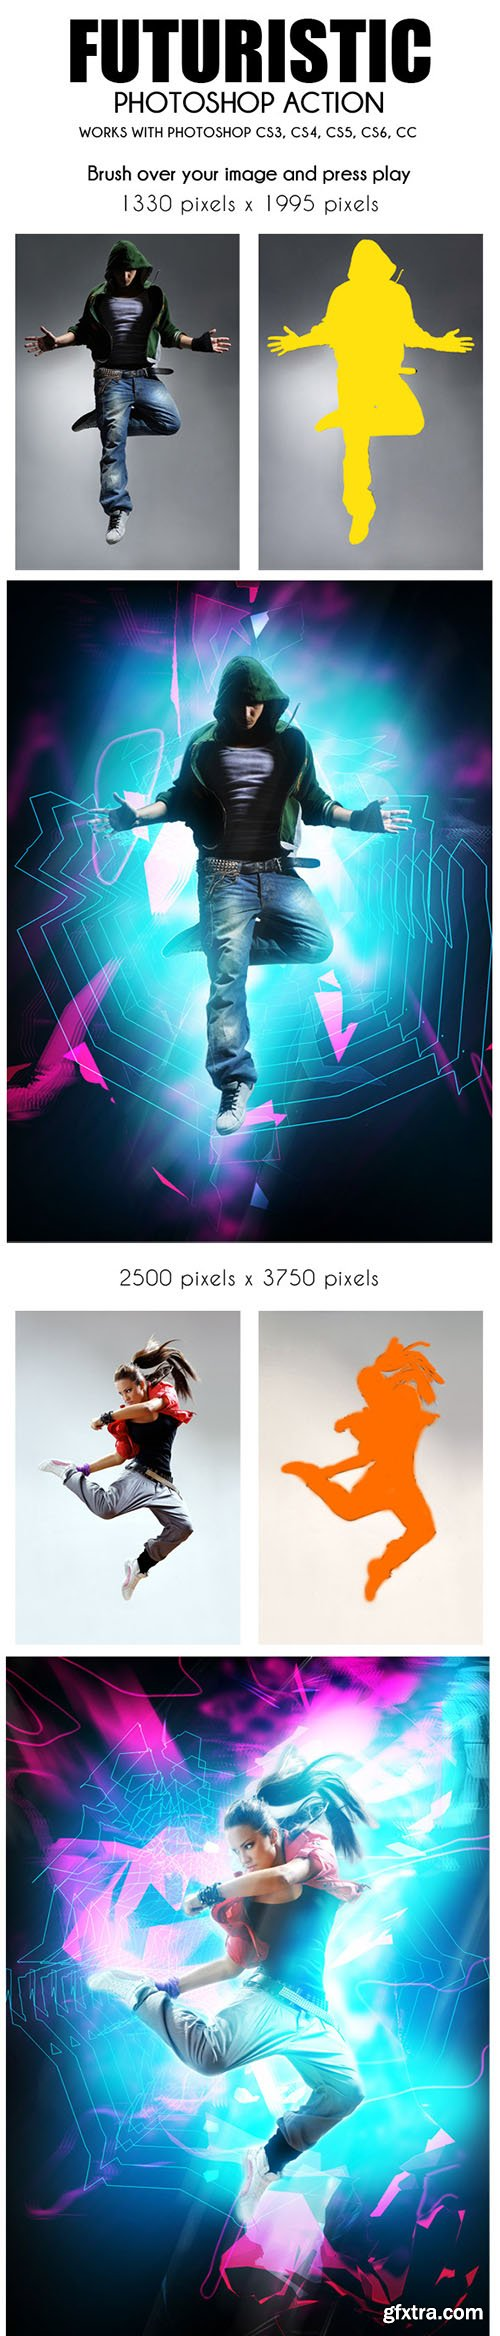 GraphicRiver Futuristic Photoshop Action 10839789